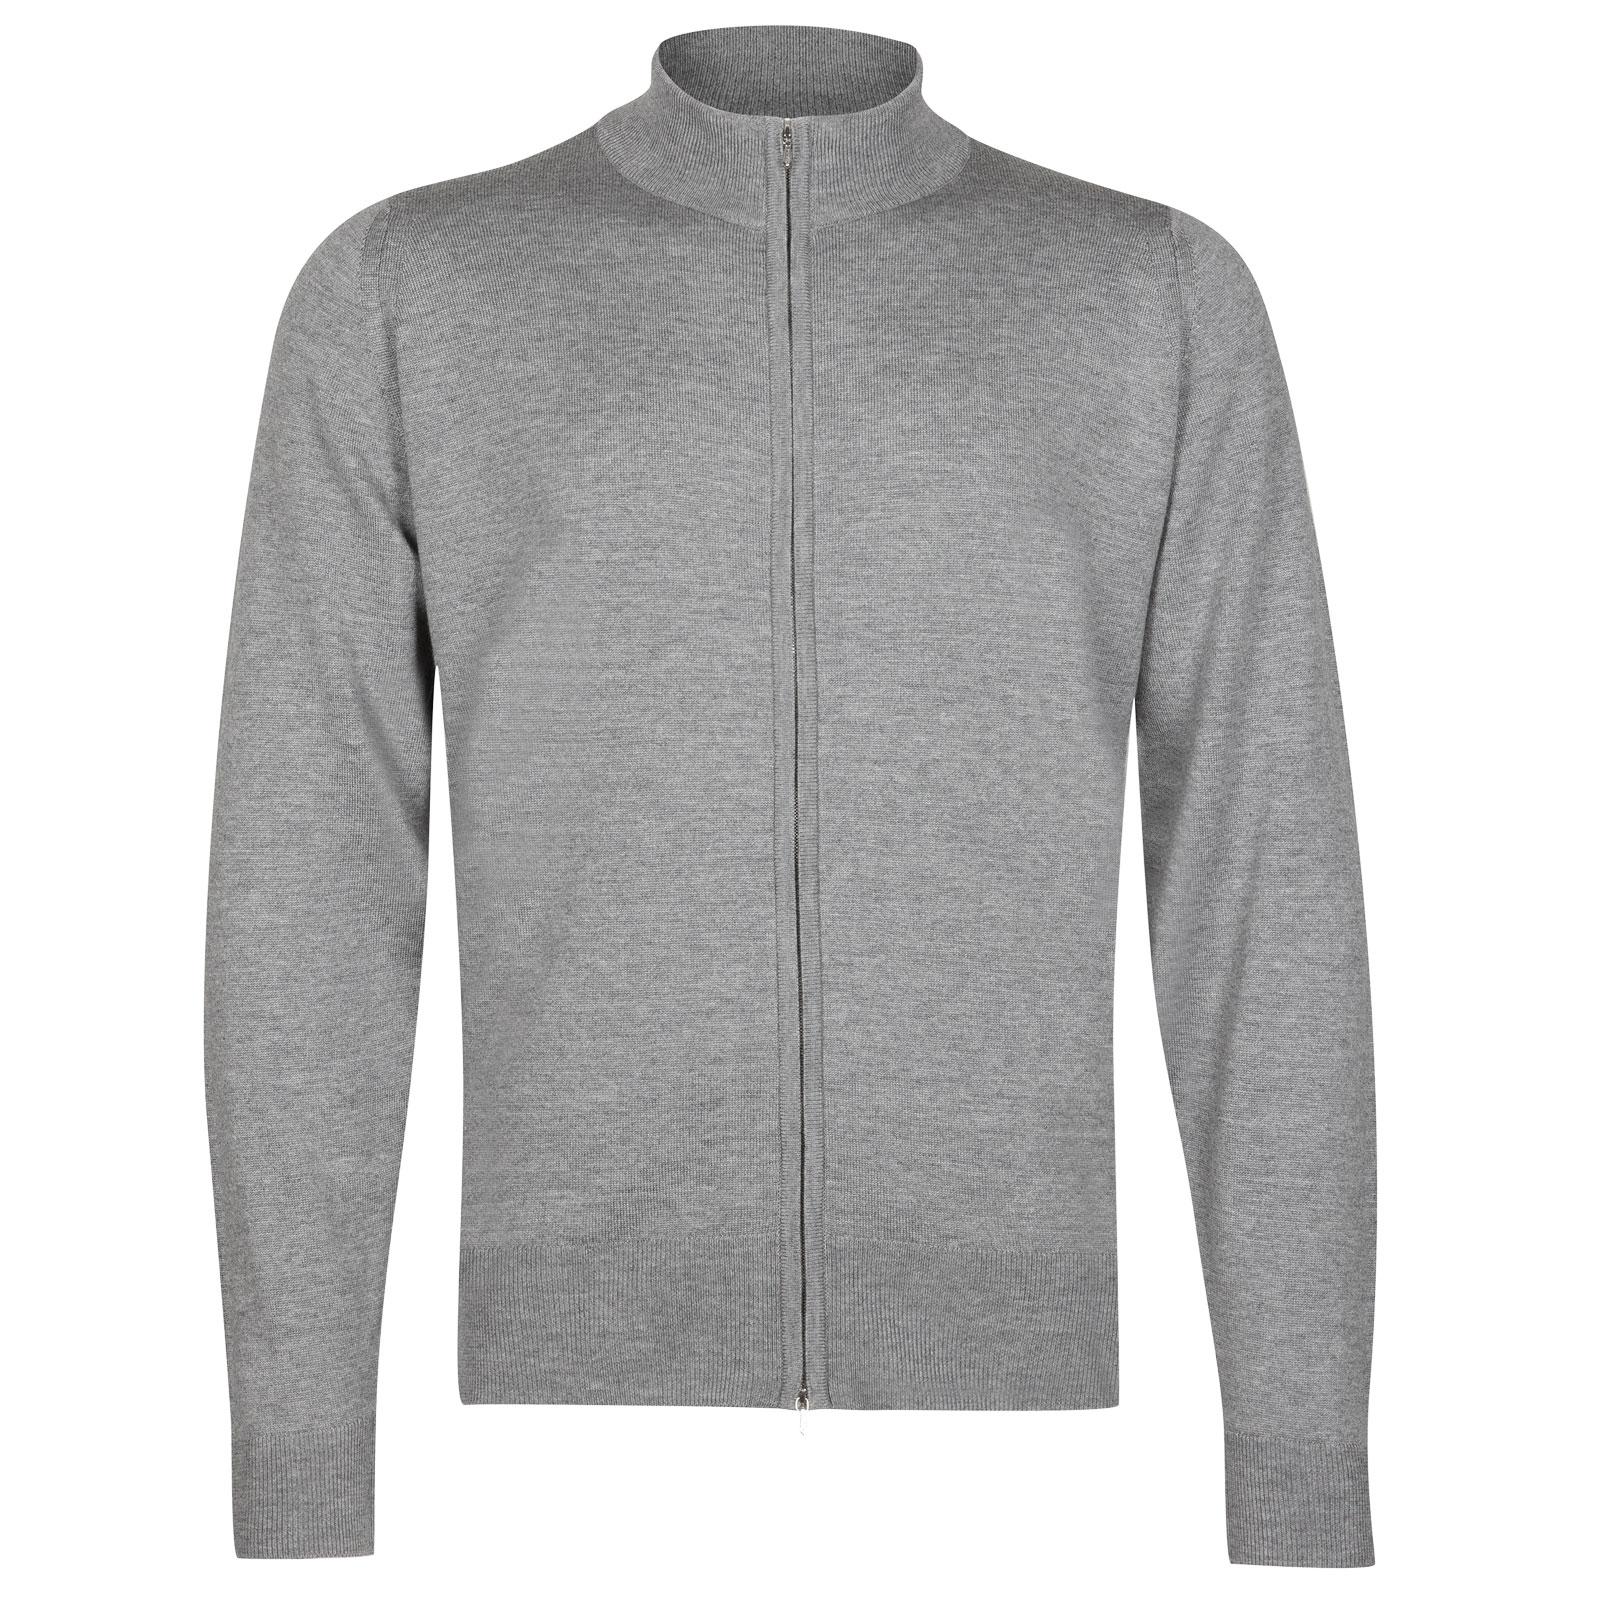 John Smedley claygate Merino Wool Jacket in Silver-M